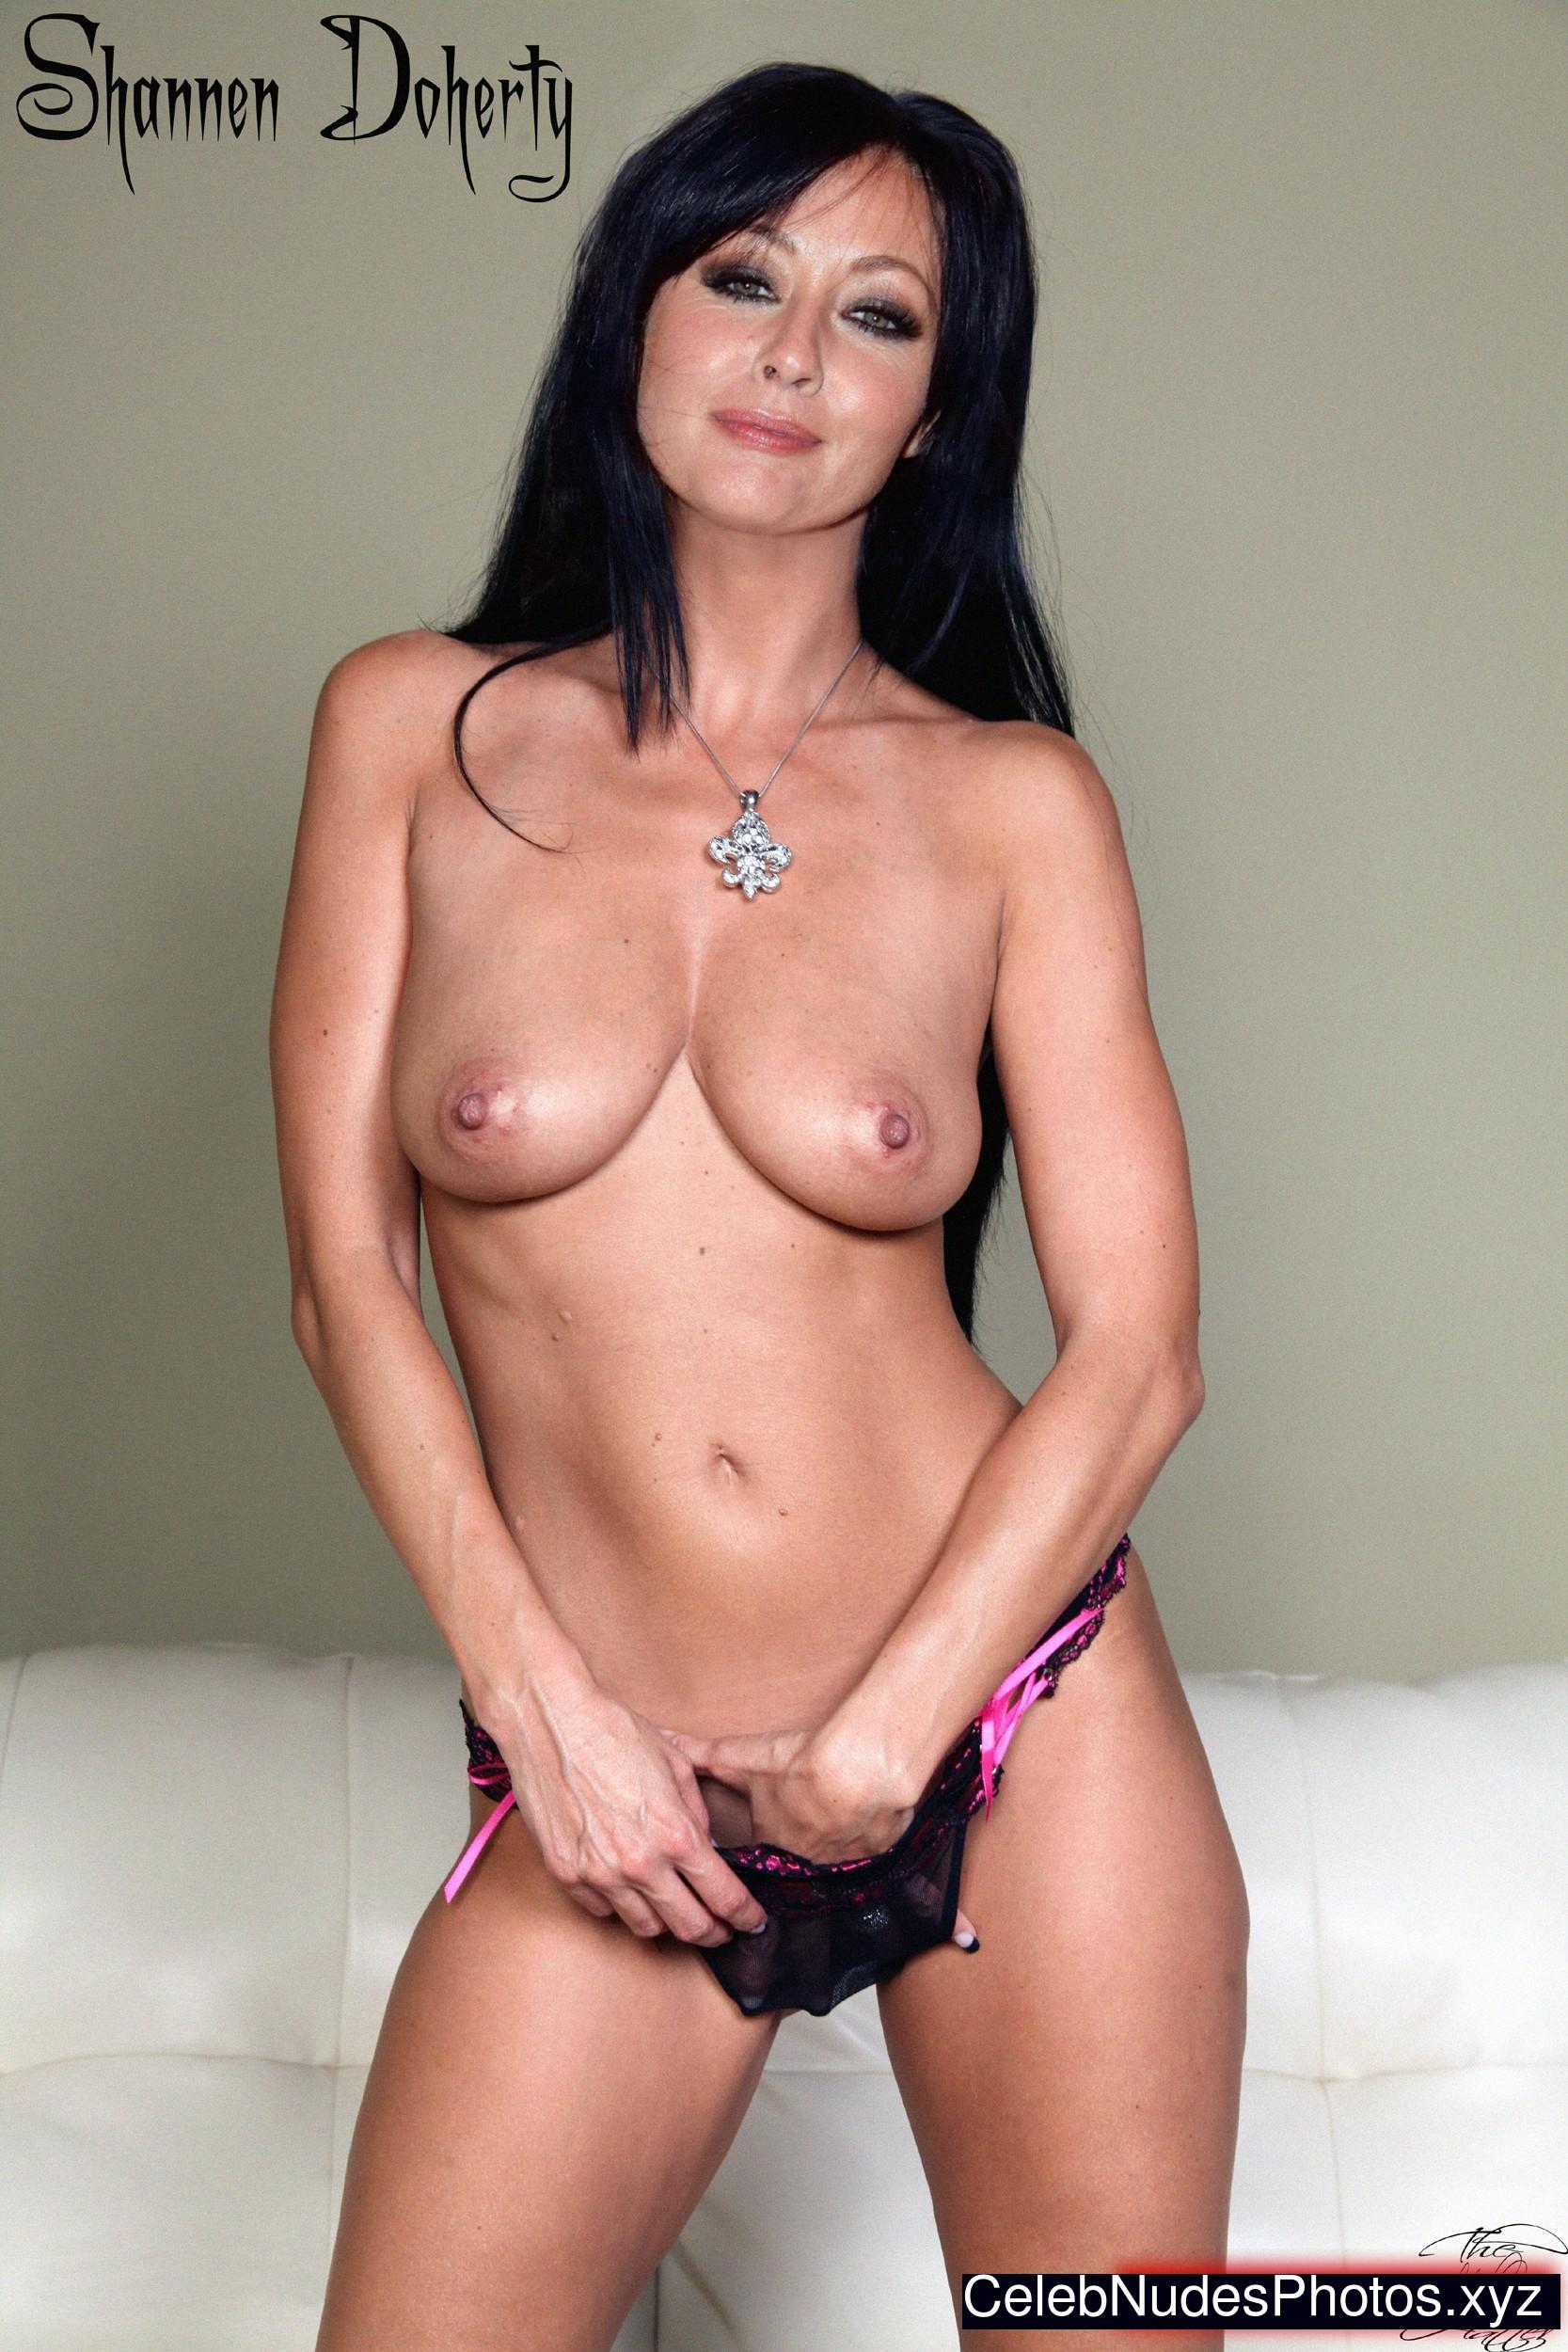 Shannen doherty nude masturbation pics